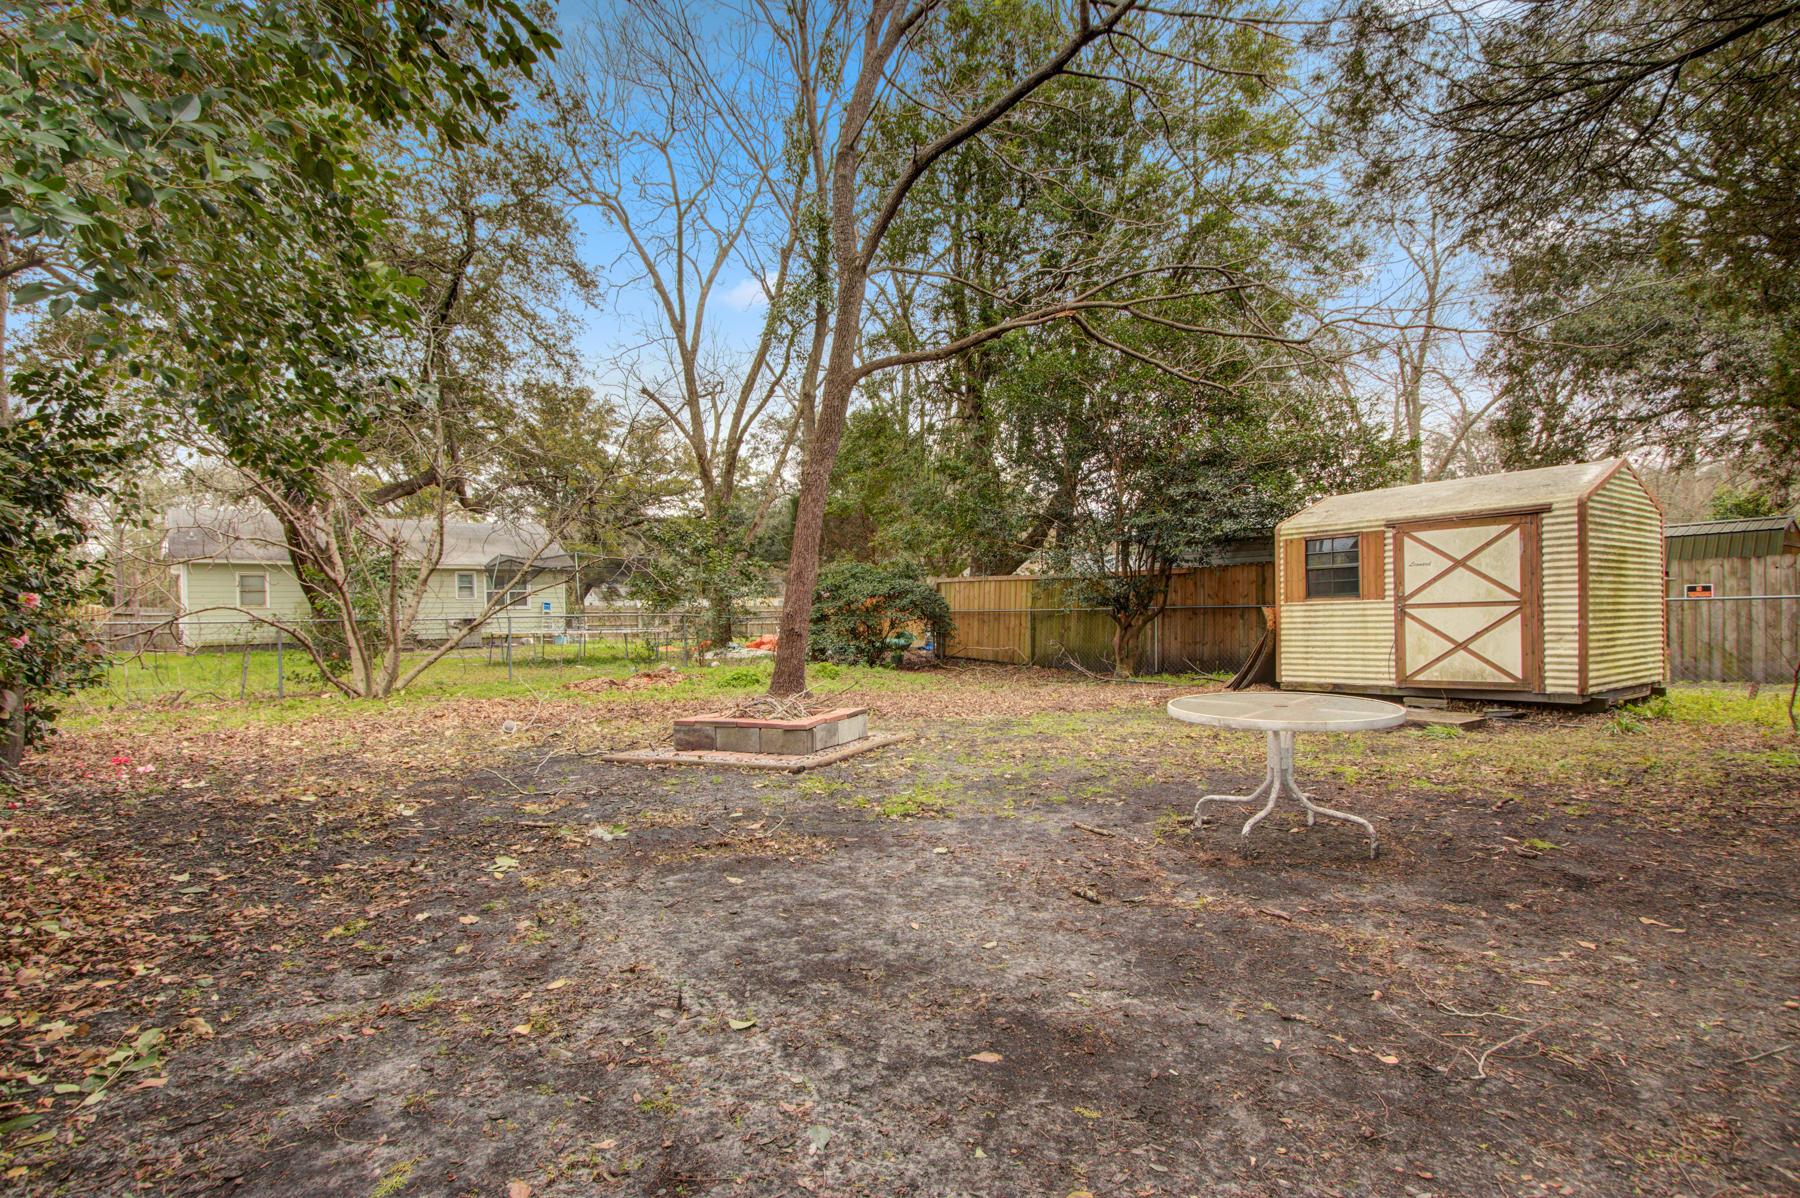 Port Park Homes For Sale - 5820 Sledge, Hanahan, SC - 24